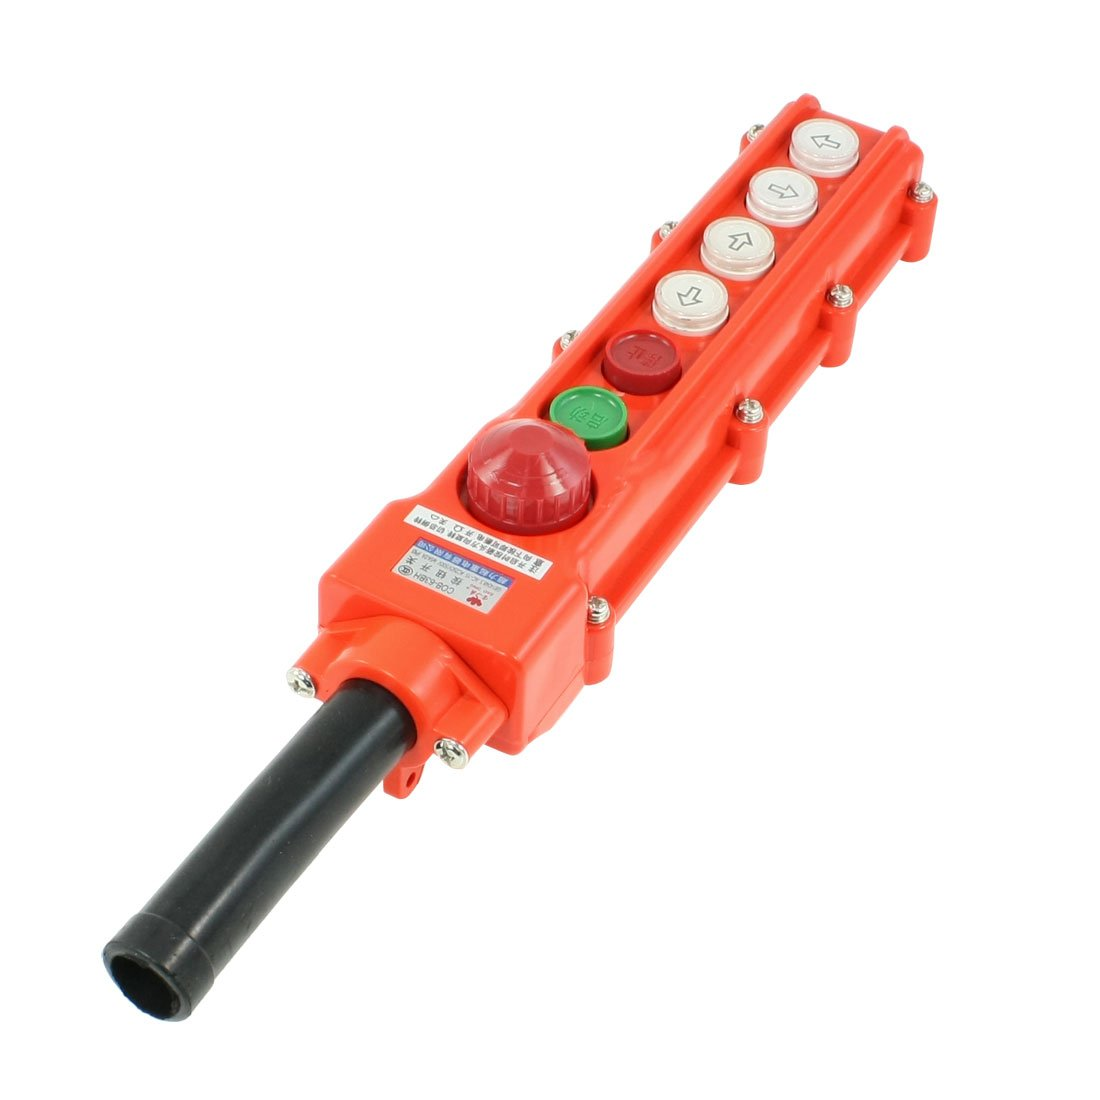 uxcell Rain Proof Hoist Crane Pendant Pushbutton Switch 4 Ways Emergency Stop COB 63BH